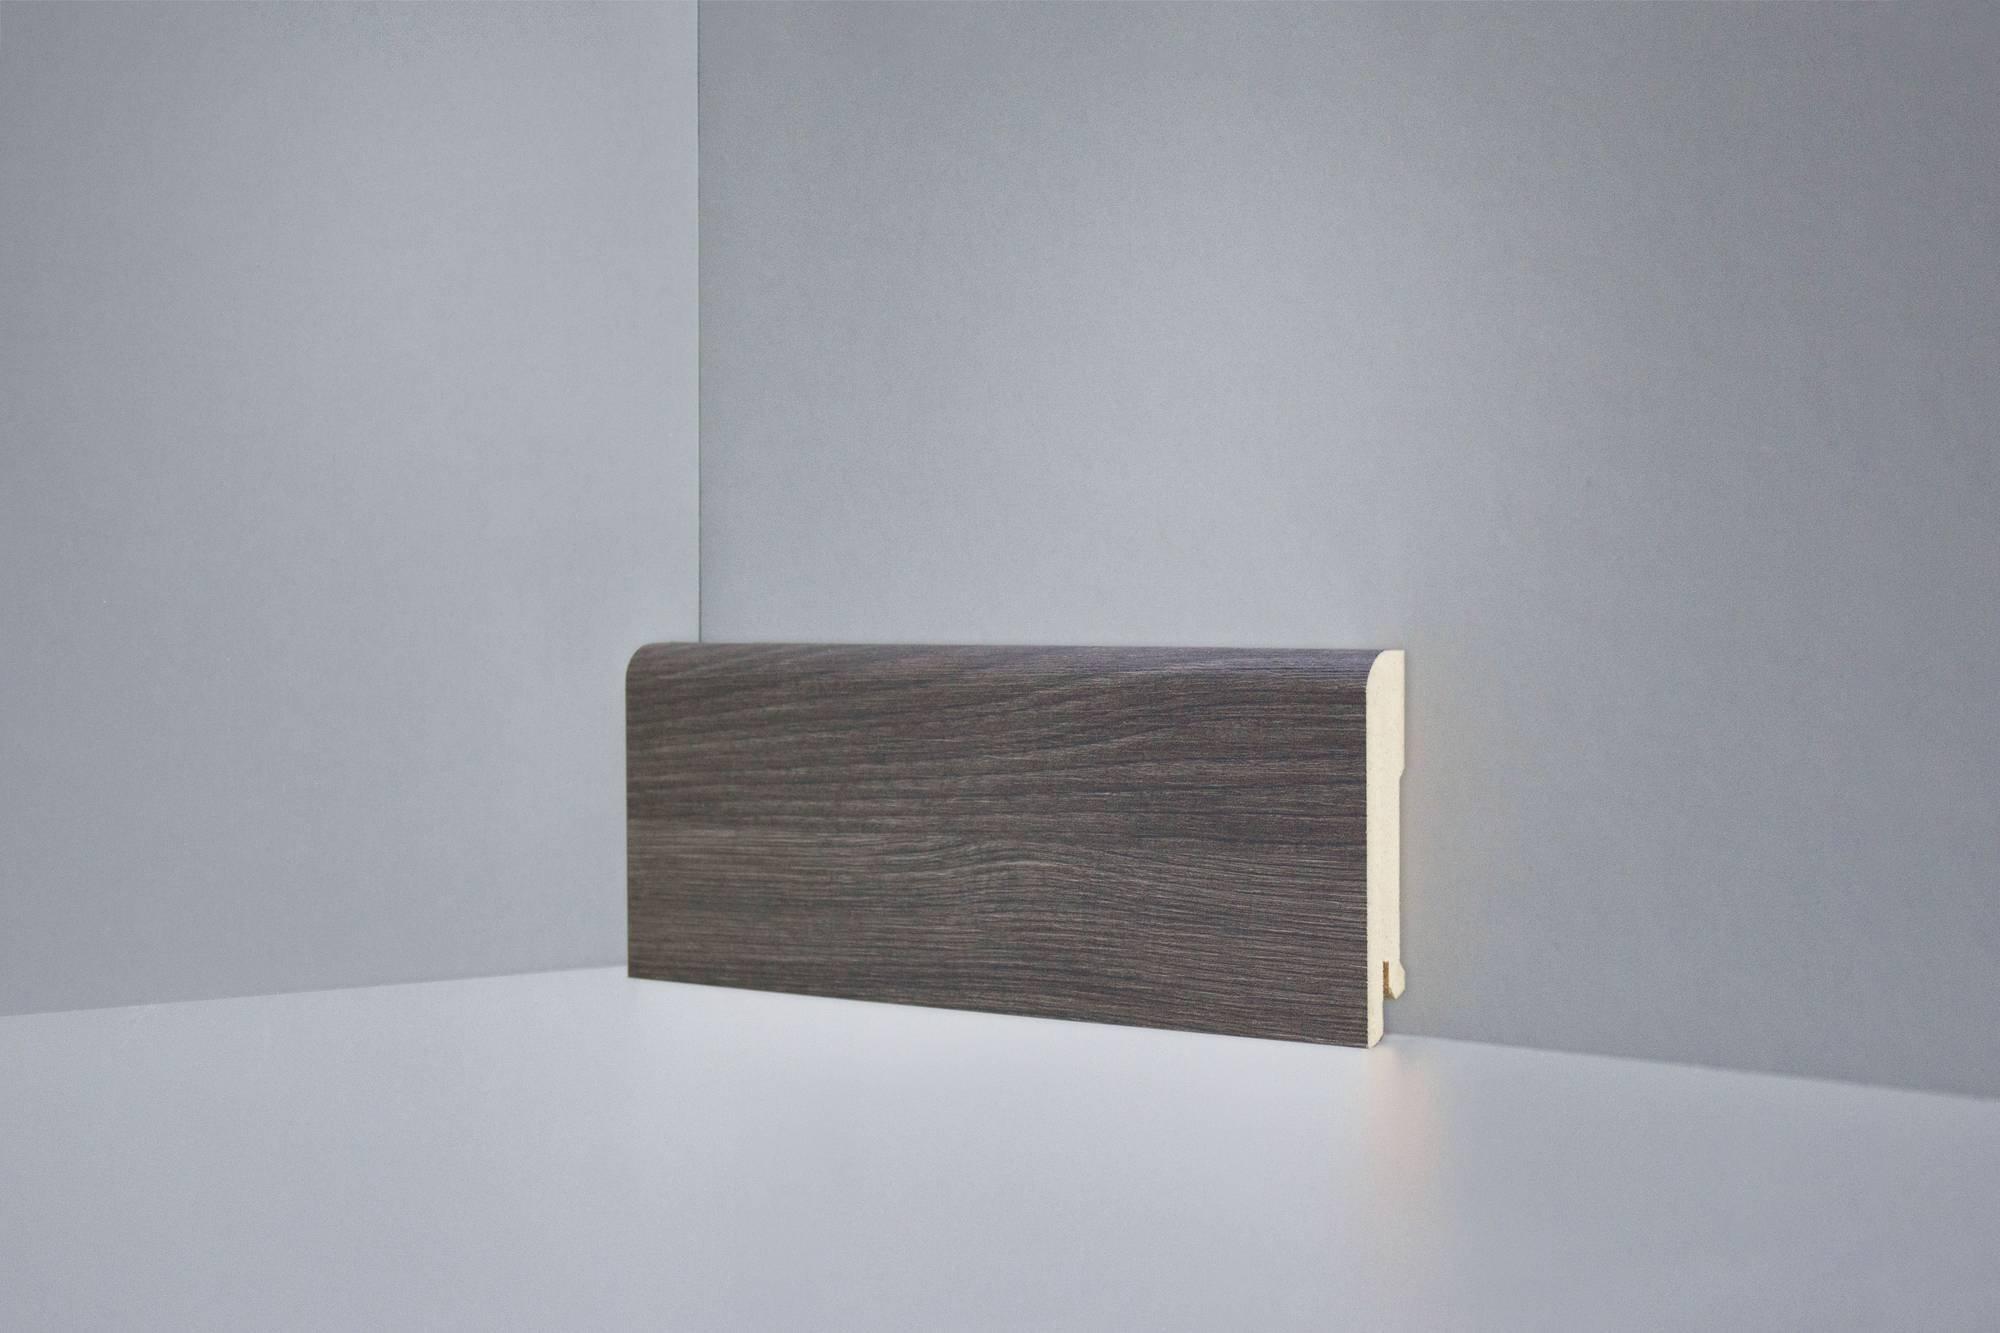 Плинтус напольный Deartio Монте-Карло серый B202-03